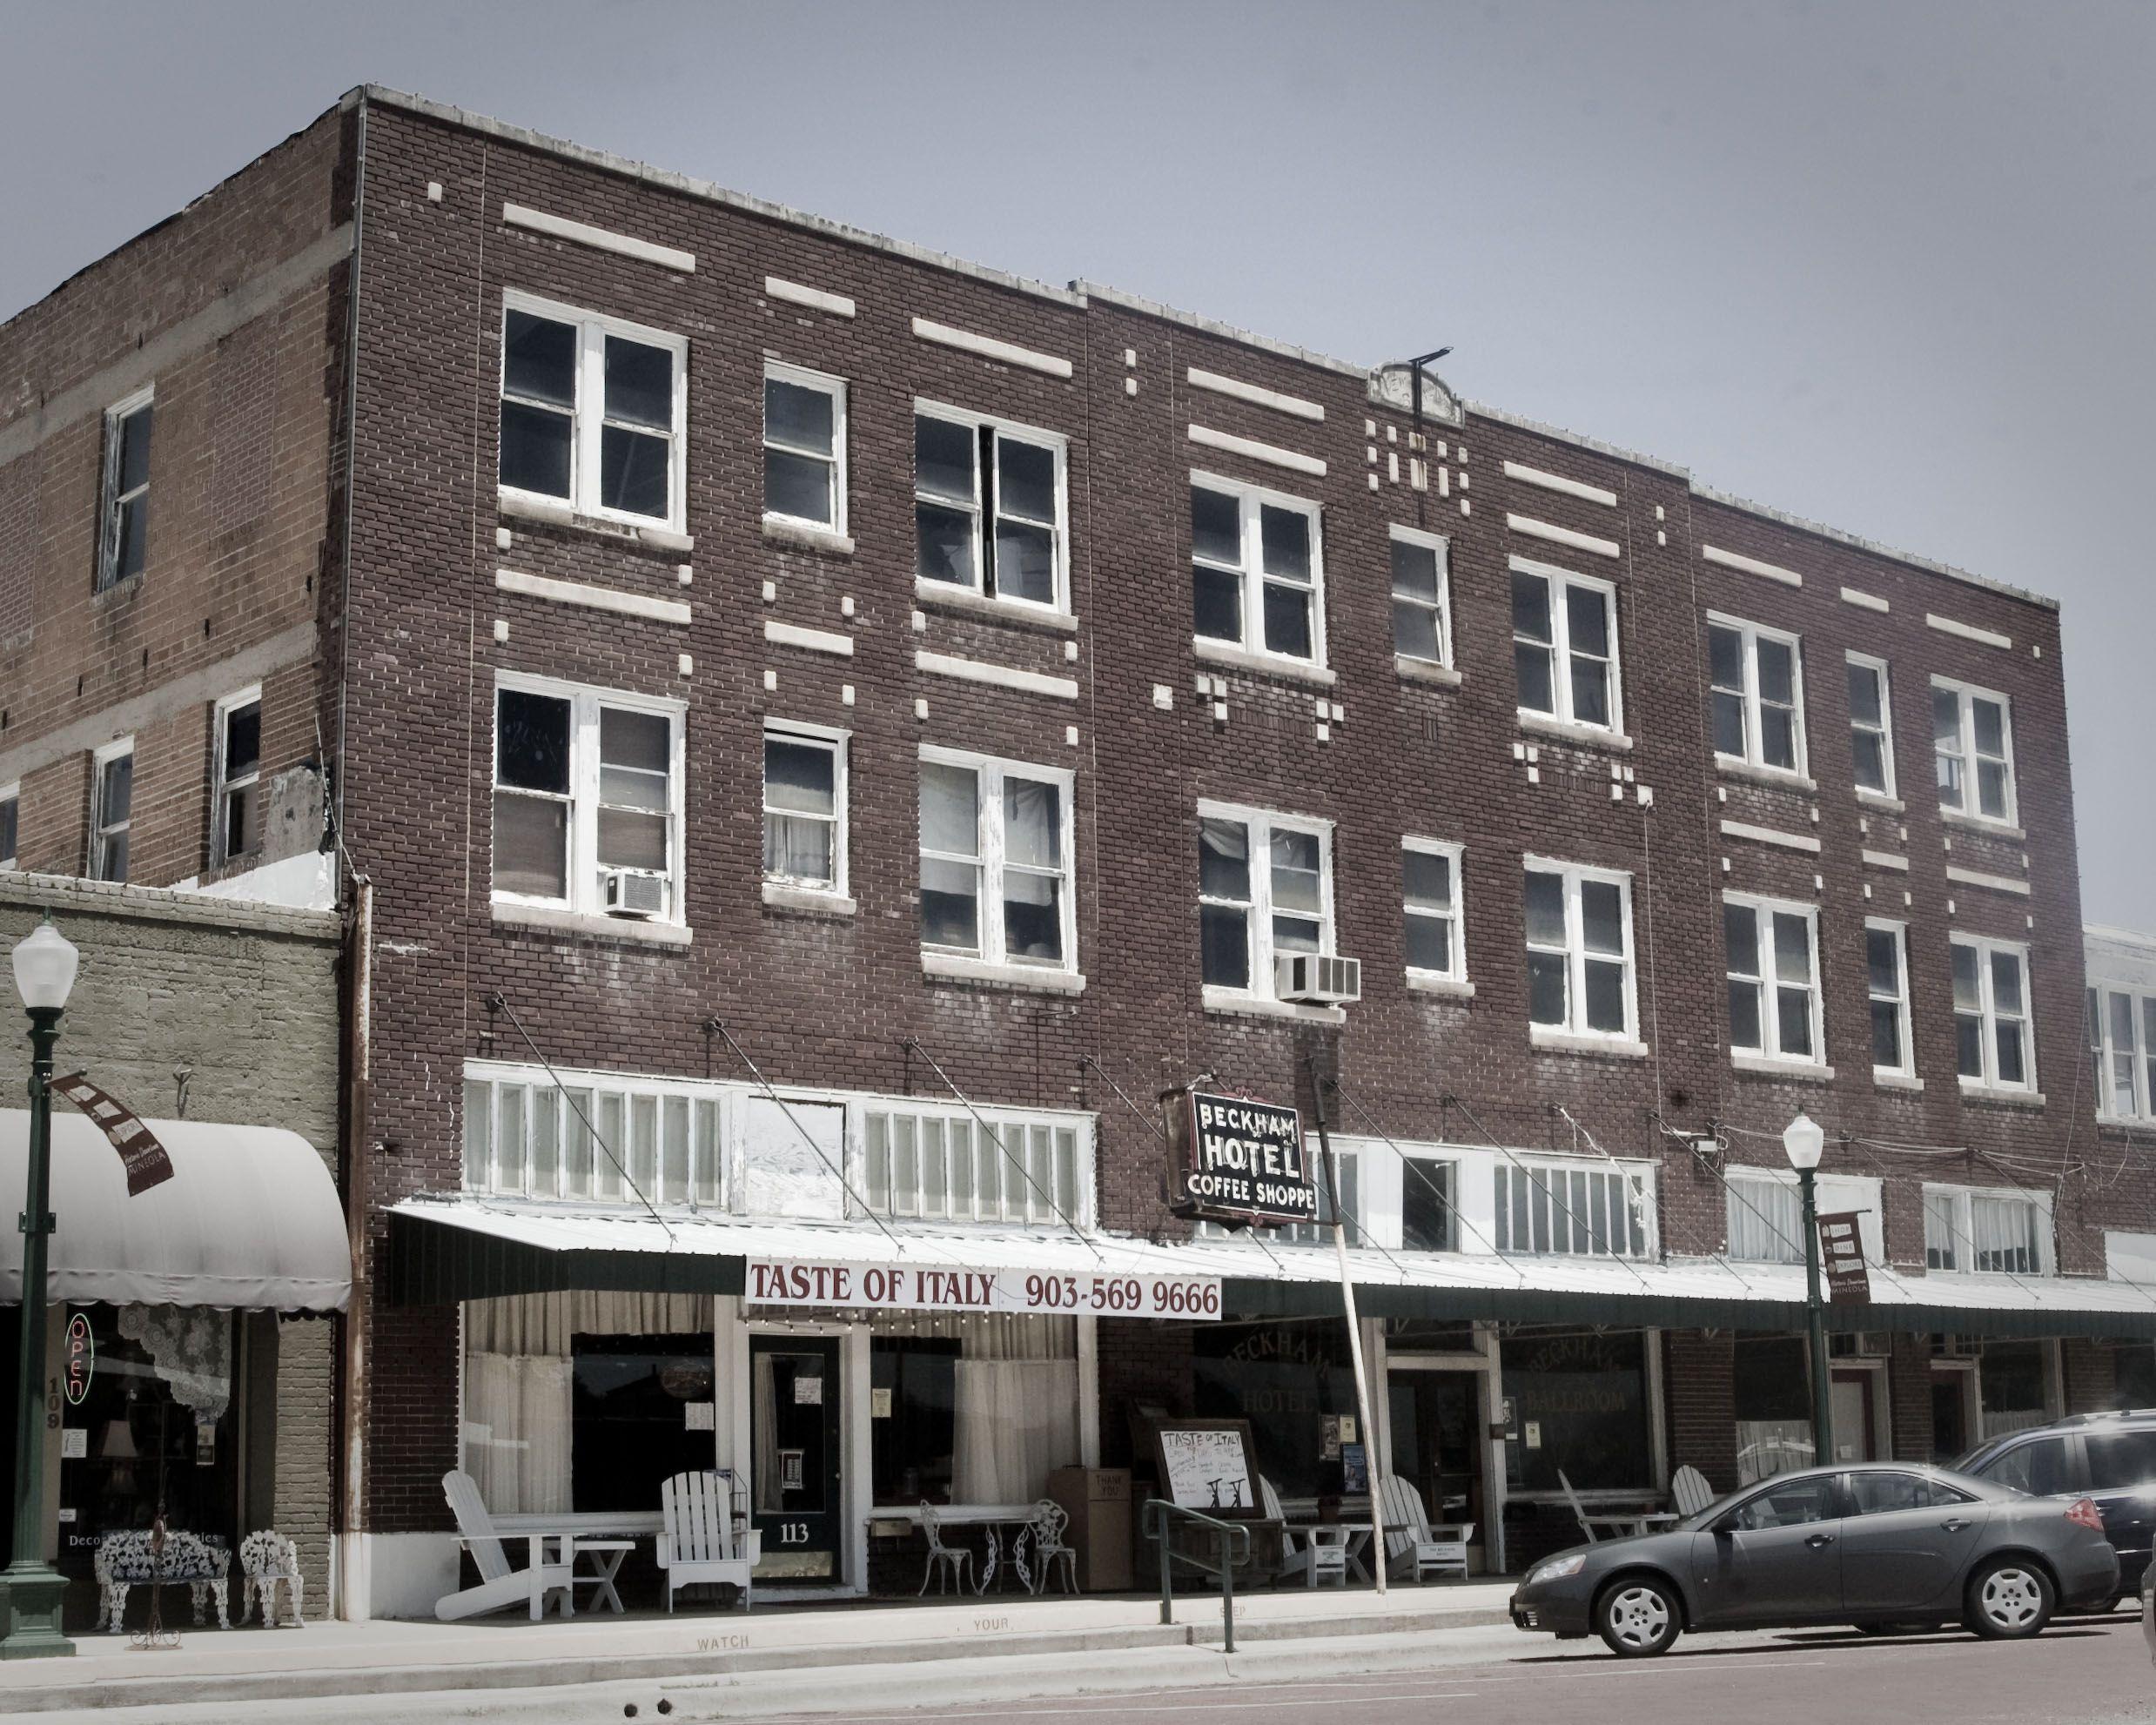 Beckham Hotel Mineola Texas Mineola Texas Mineola Hotel